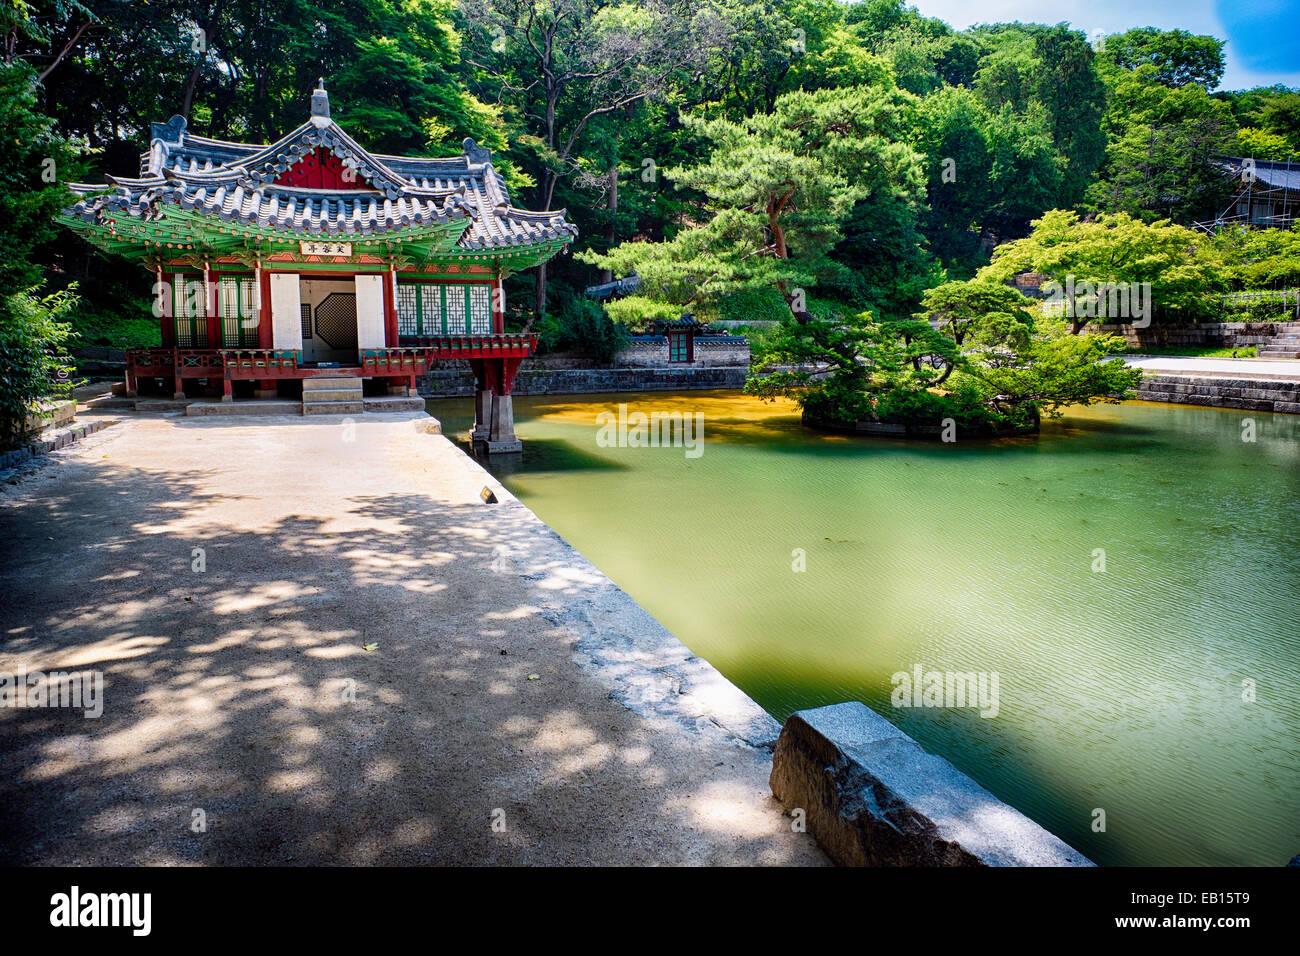 Pabellón Buyongjeong con un estanque, área Huwon, Jardín Secreto, Complejo de palacio Changdeokgung, Imagen De Stock